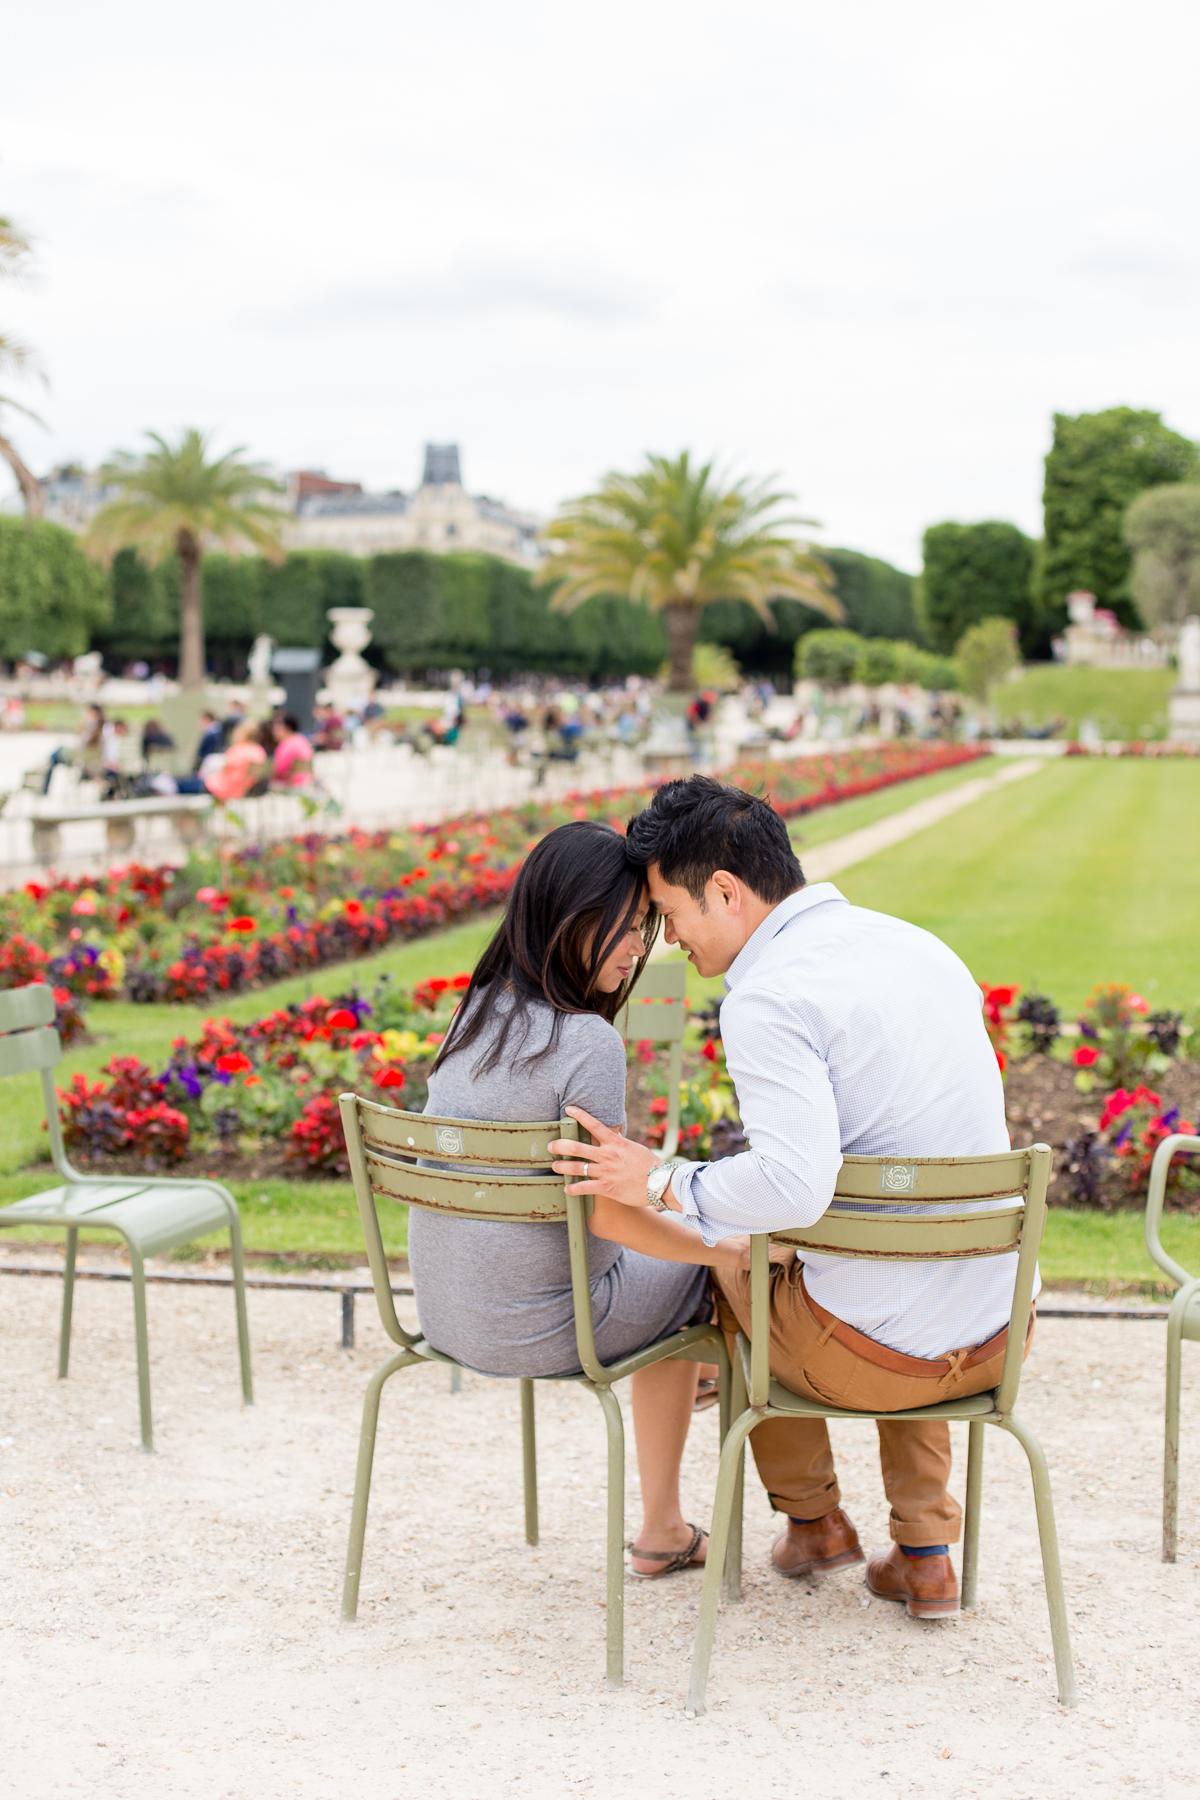 destination-maternity-photographer-paris_012.jpg